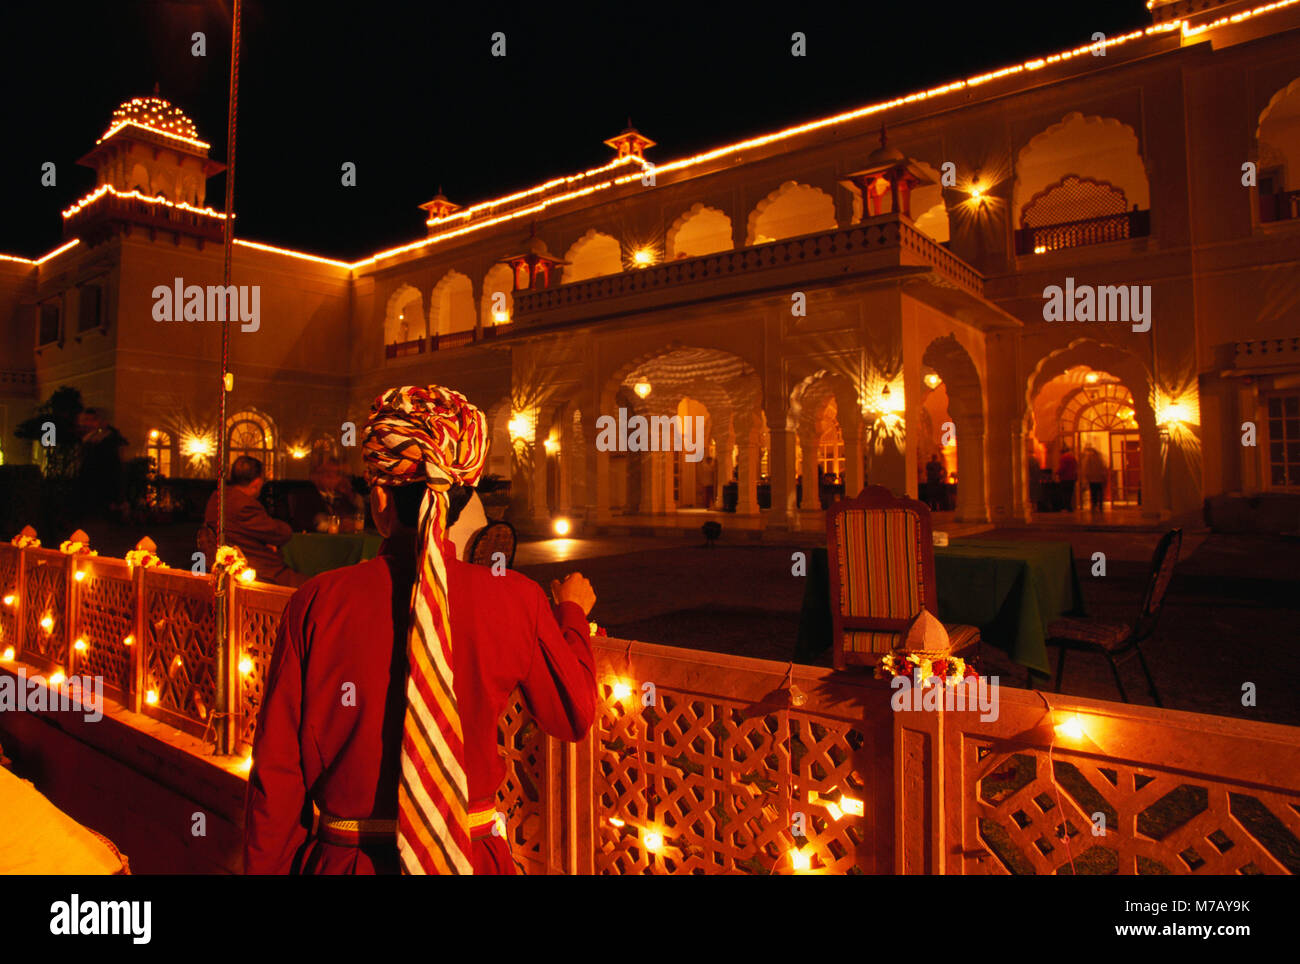 Palace lit up at night, Jai Mahal Palace Hotel, Jaipur, Rajasthan, India - Stock Image